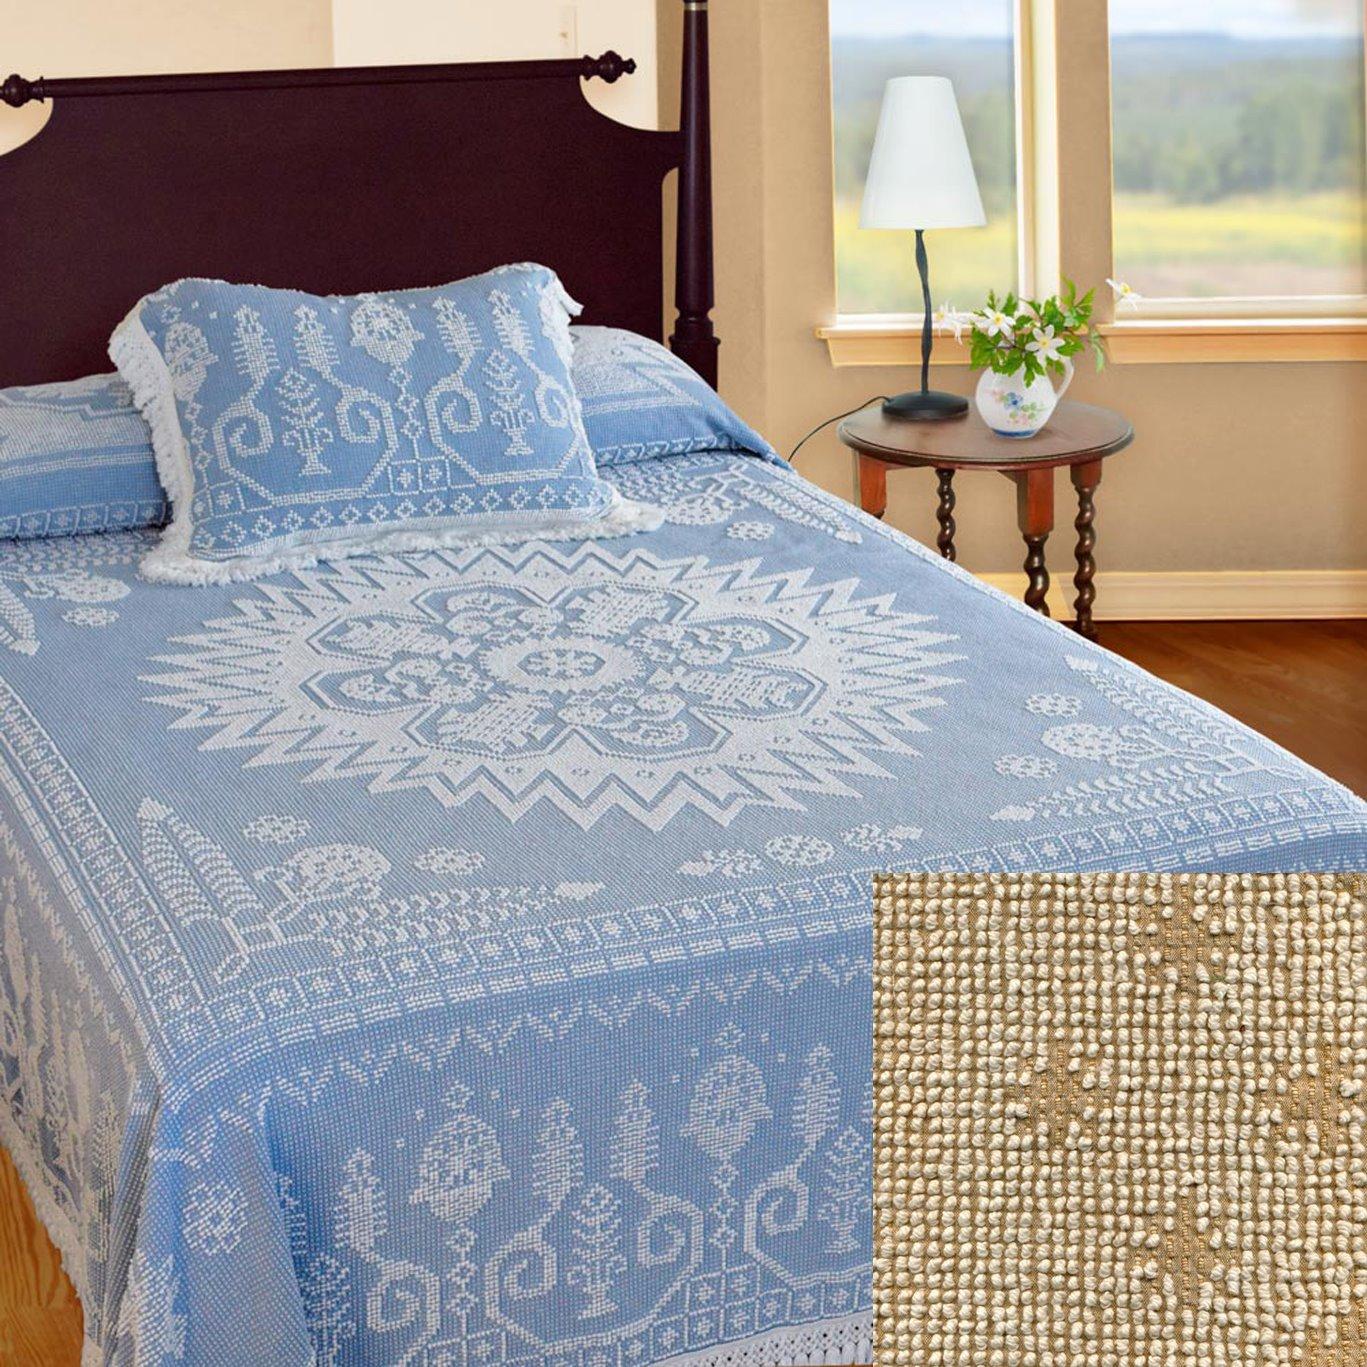 Spirit of America Bedspread Twin Linen